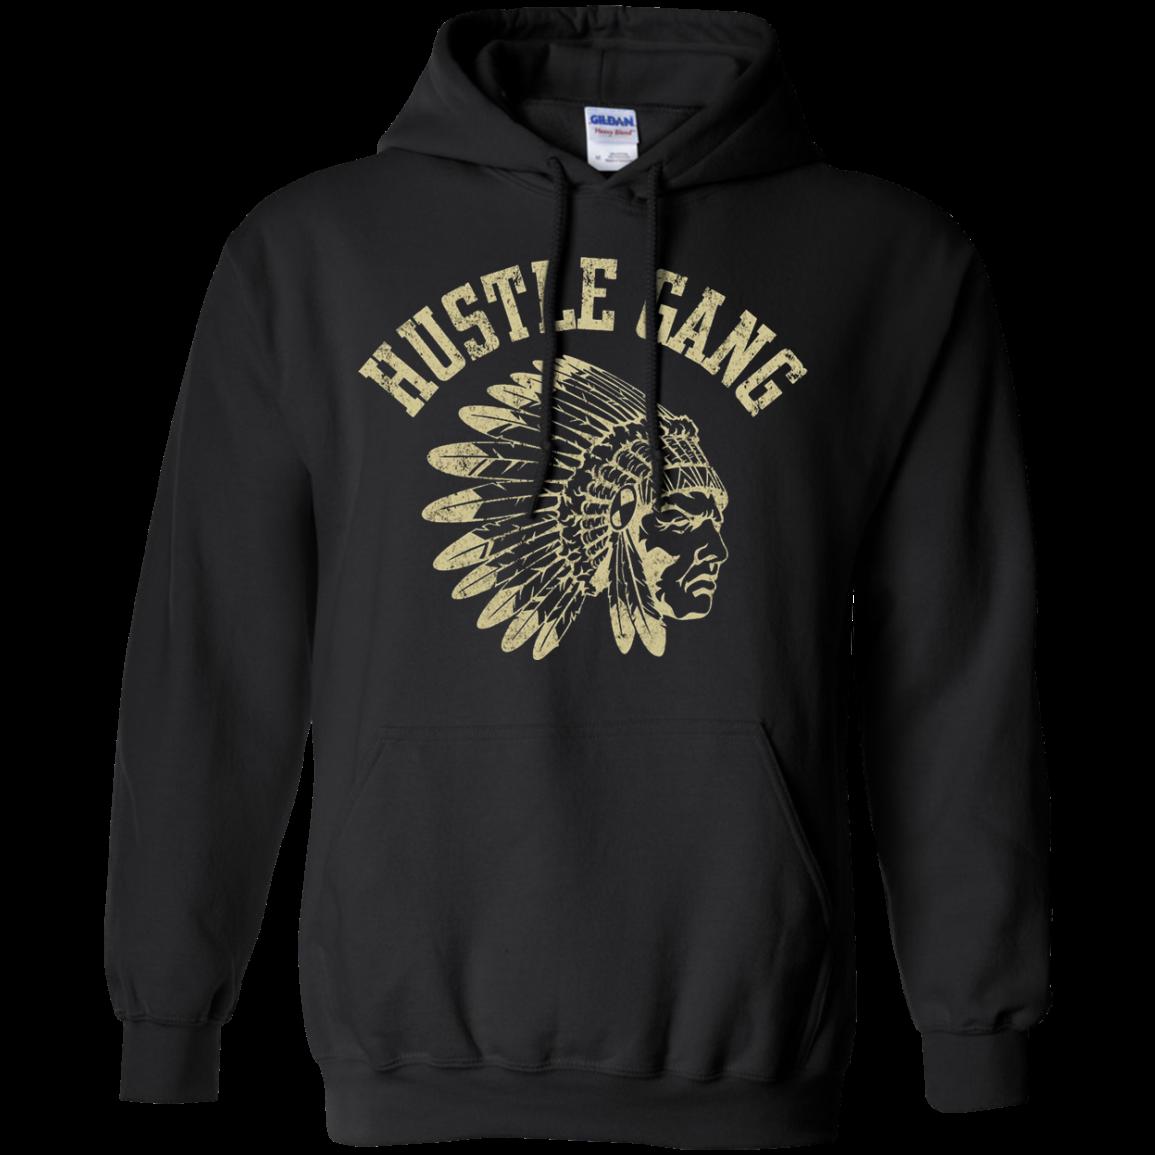 Hustle Gang Shirts Hustle Gang Hoodie Hoodies Forest Print Shirt [ 1155 x 1155 Pixel ]